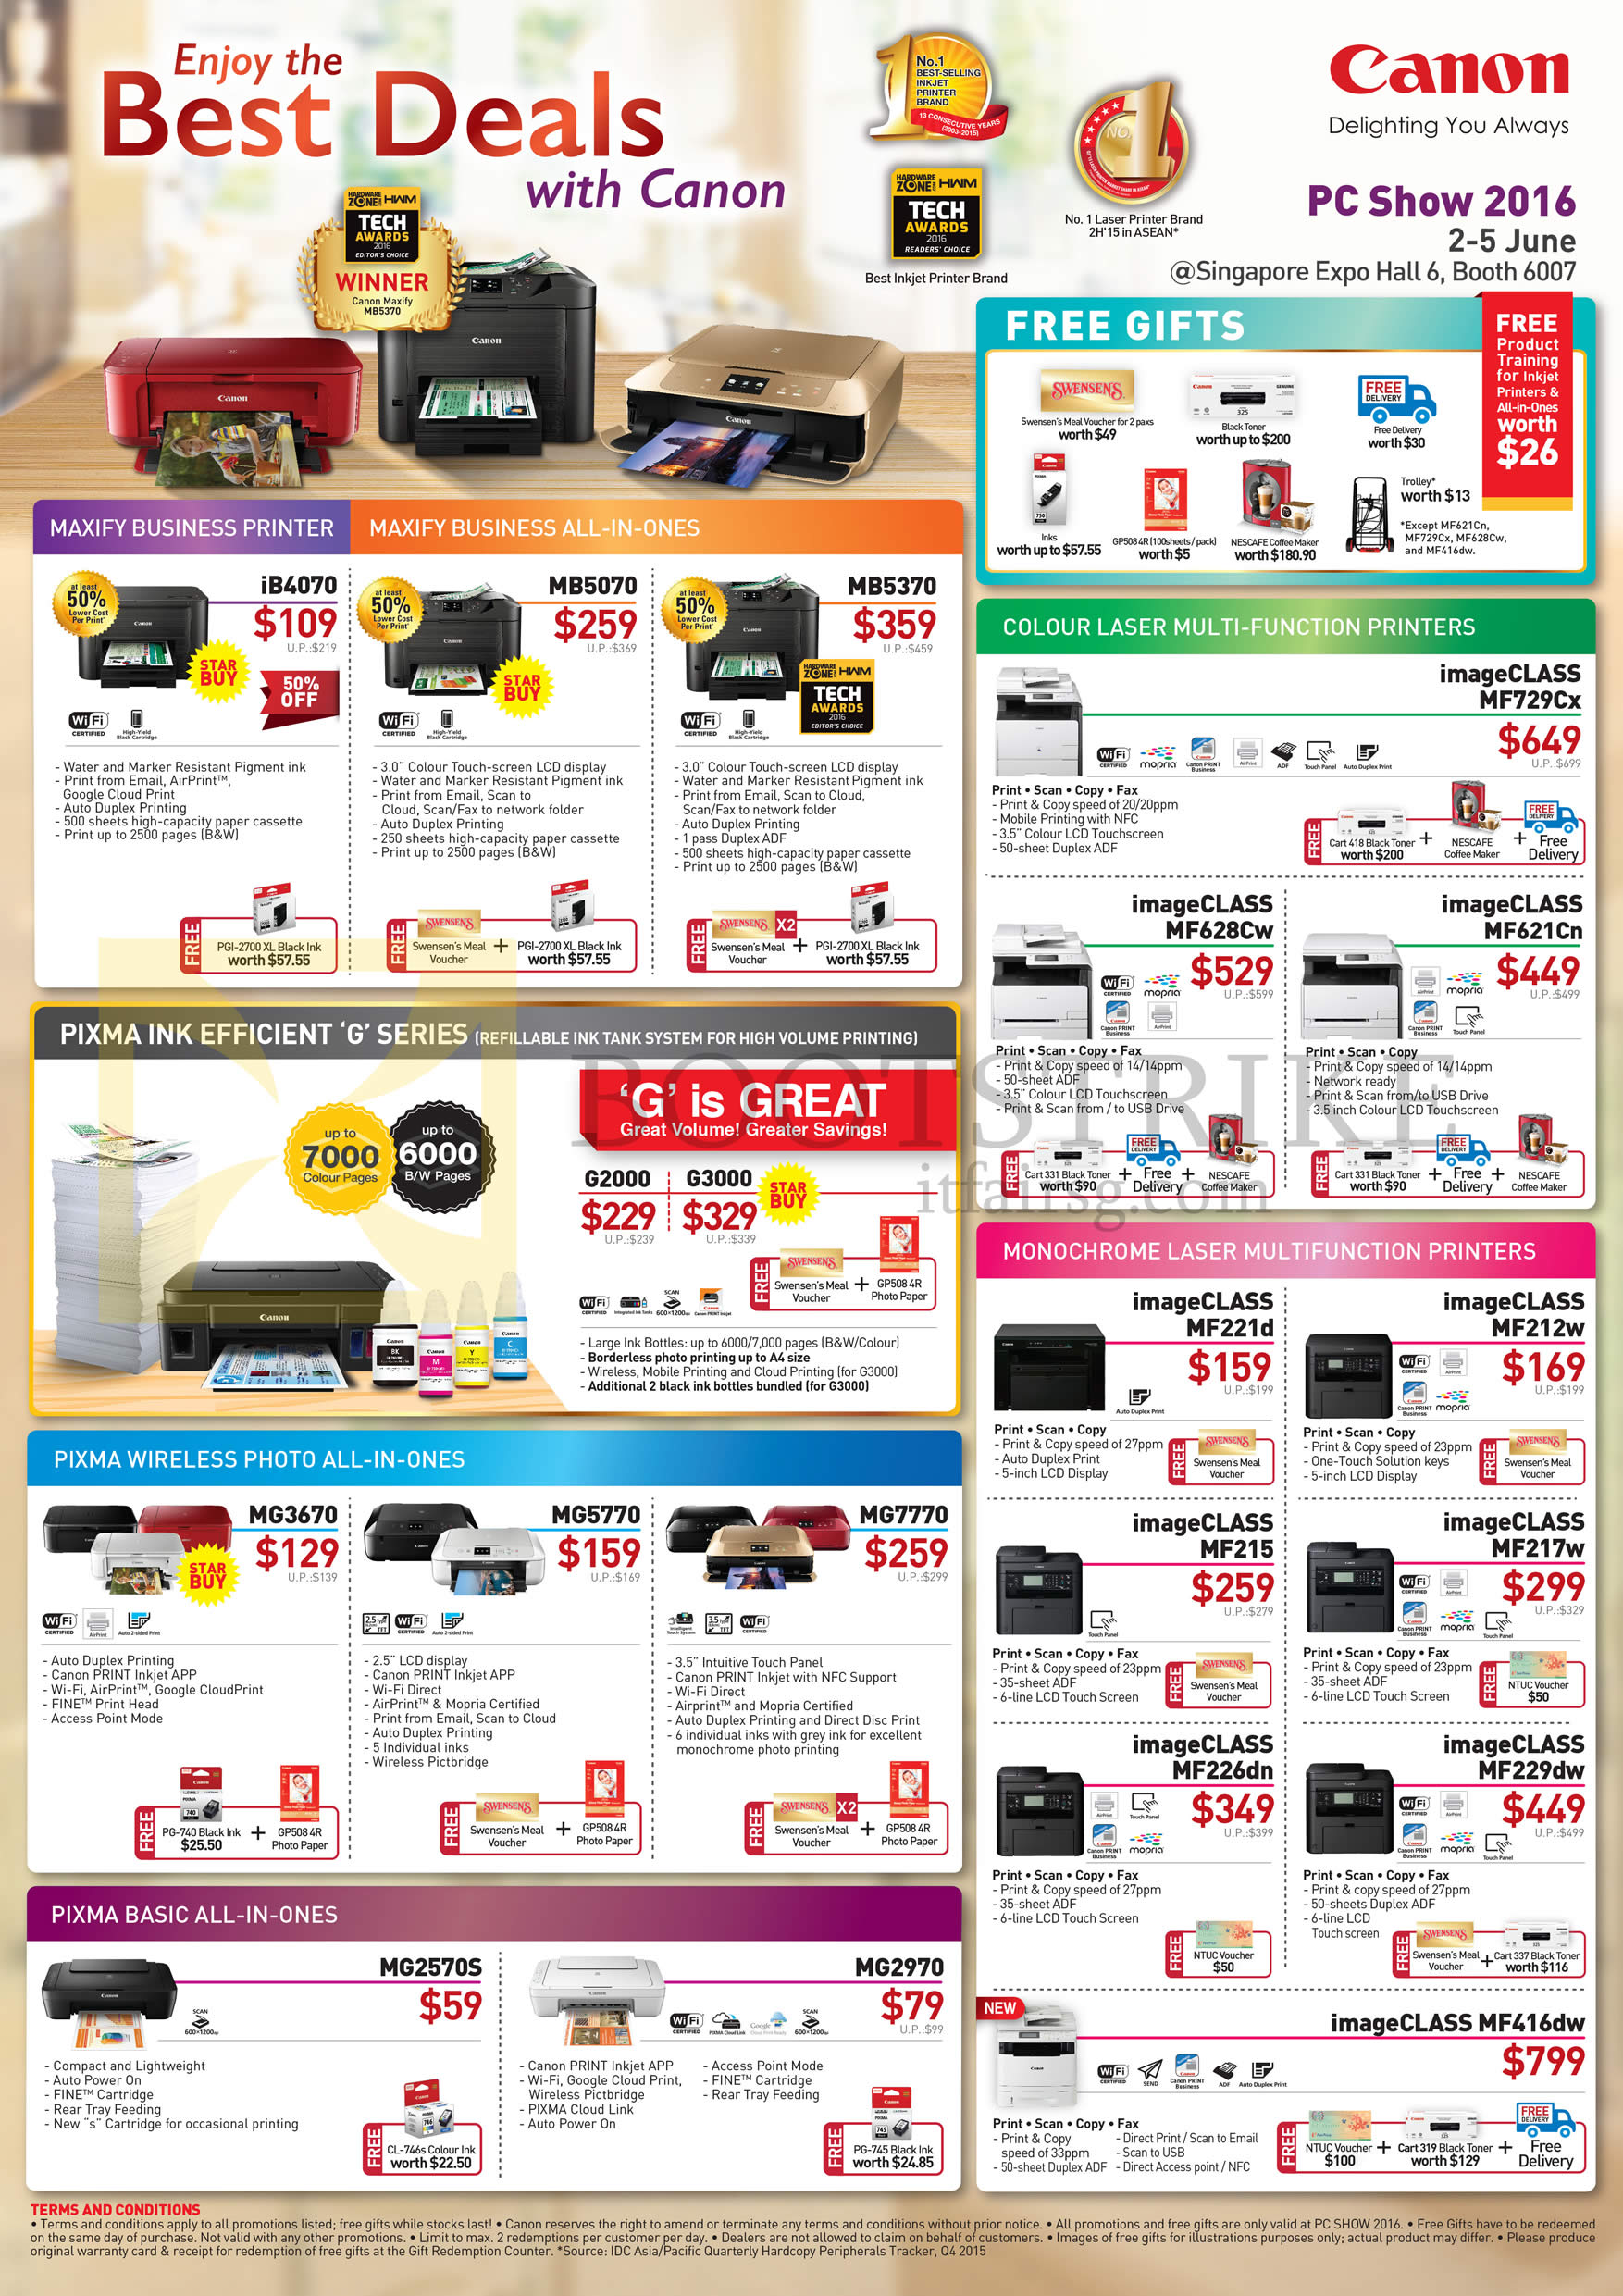 PC SHOW 2016 price list image brochure of Canon Printers Pixma IB4070, MB5070, MB5370, G2000, G3000, MG3670, MG5770, MG7770, MG2570S, MG2970, ImageCLASS MF729Cx, MF628Cw, MF621Cn, MF221d, MF212w